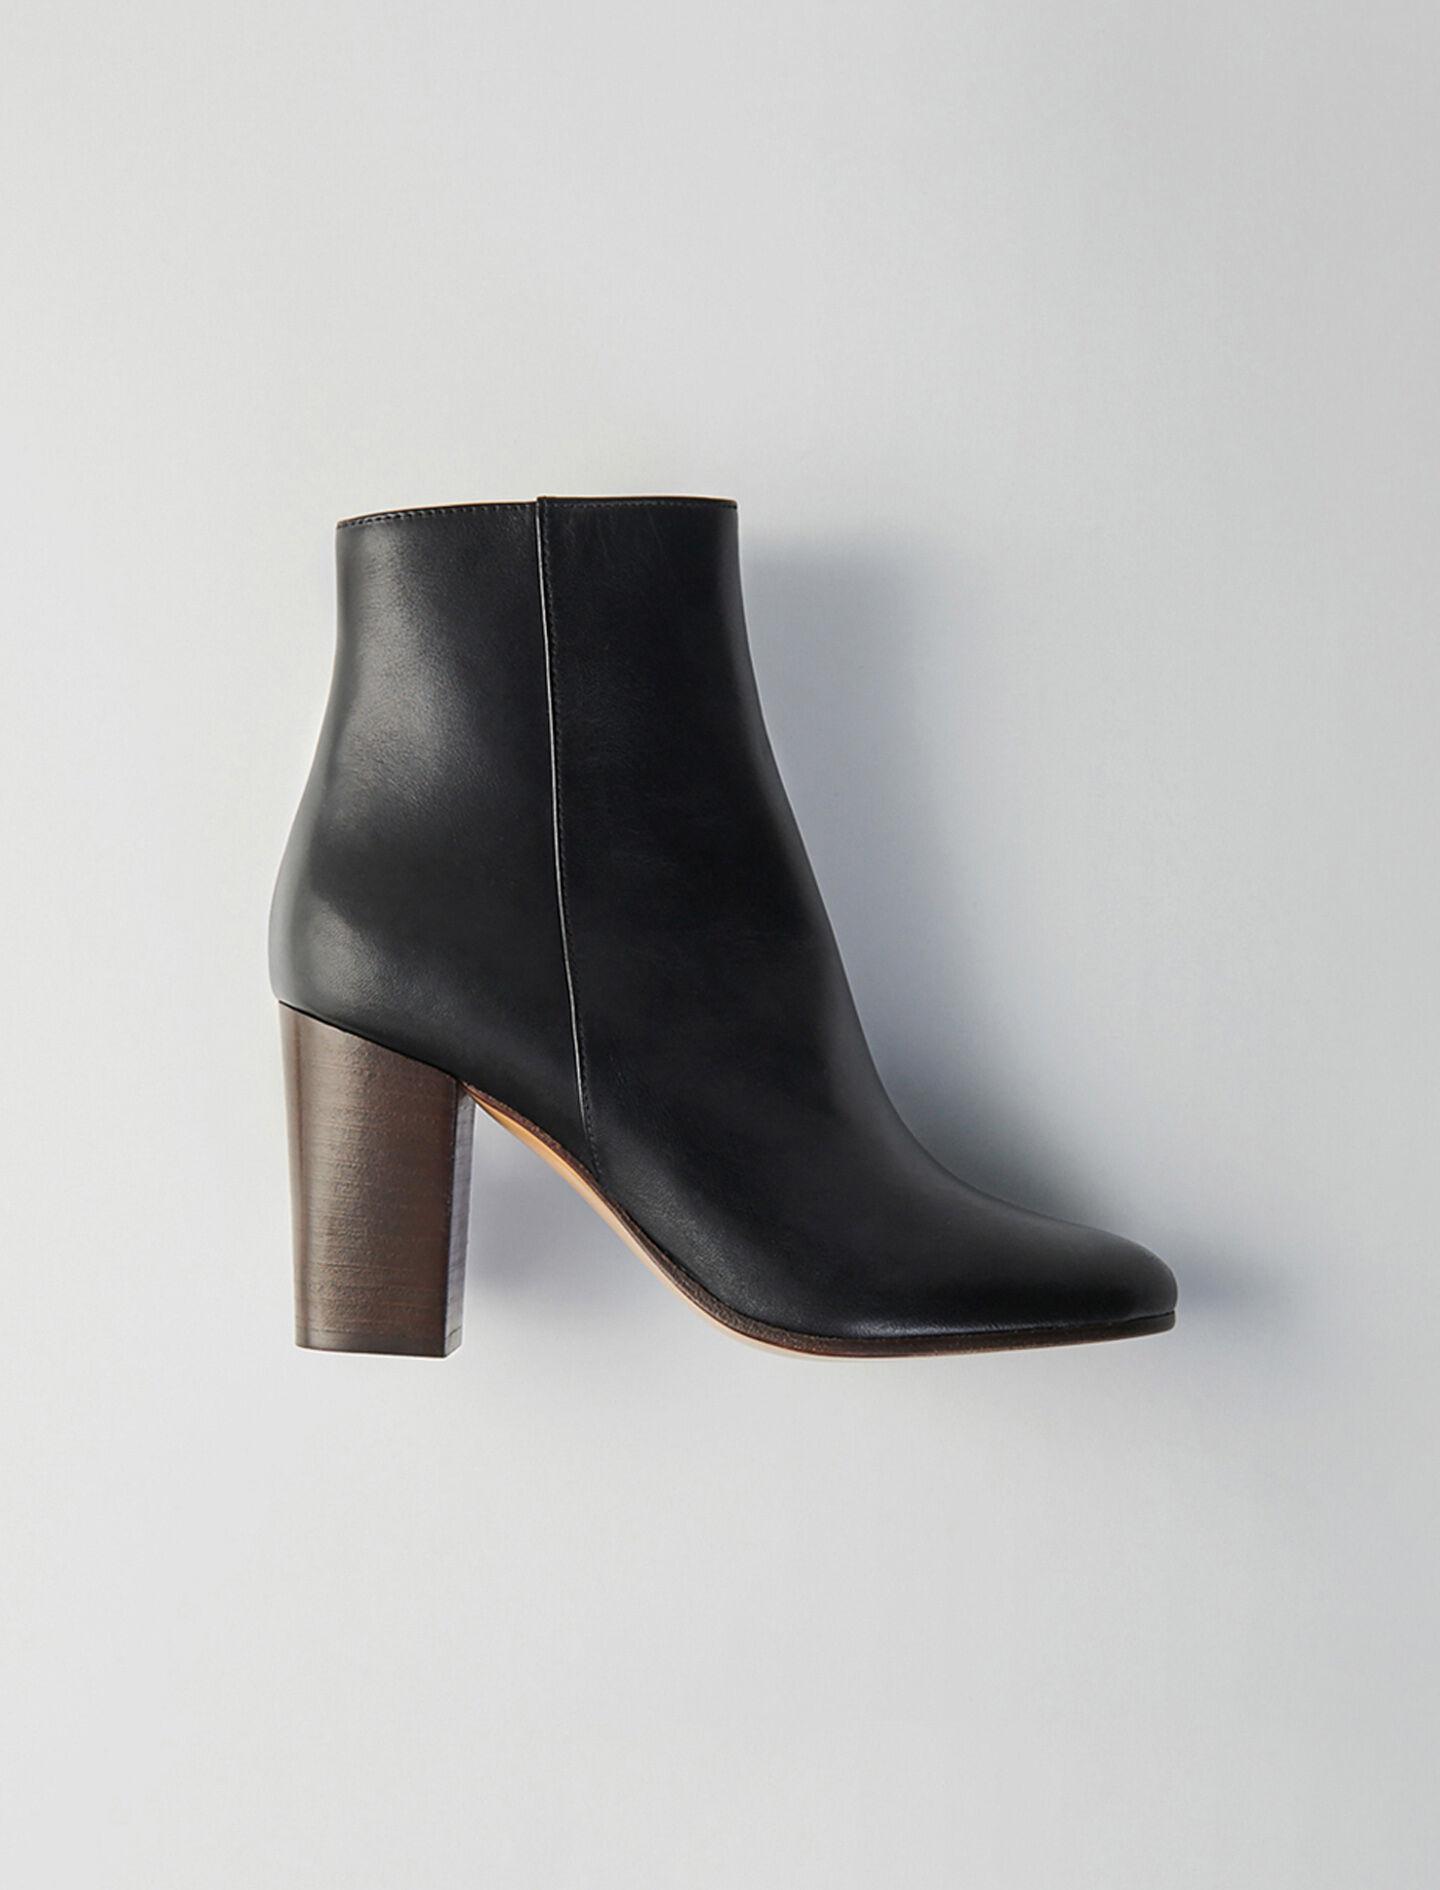 Boots Boots Kollektion Stiefelamp; Schuhe Boots Stiefelamp; Schuhe Schuhe Stiefelamp; Stiefelamp; Kollektion Boots Kollektion BoCxEWQred